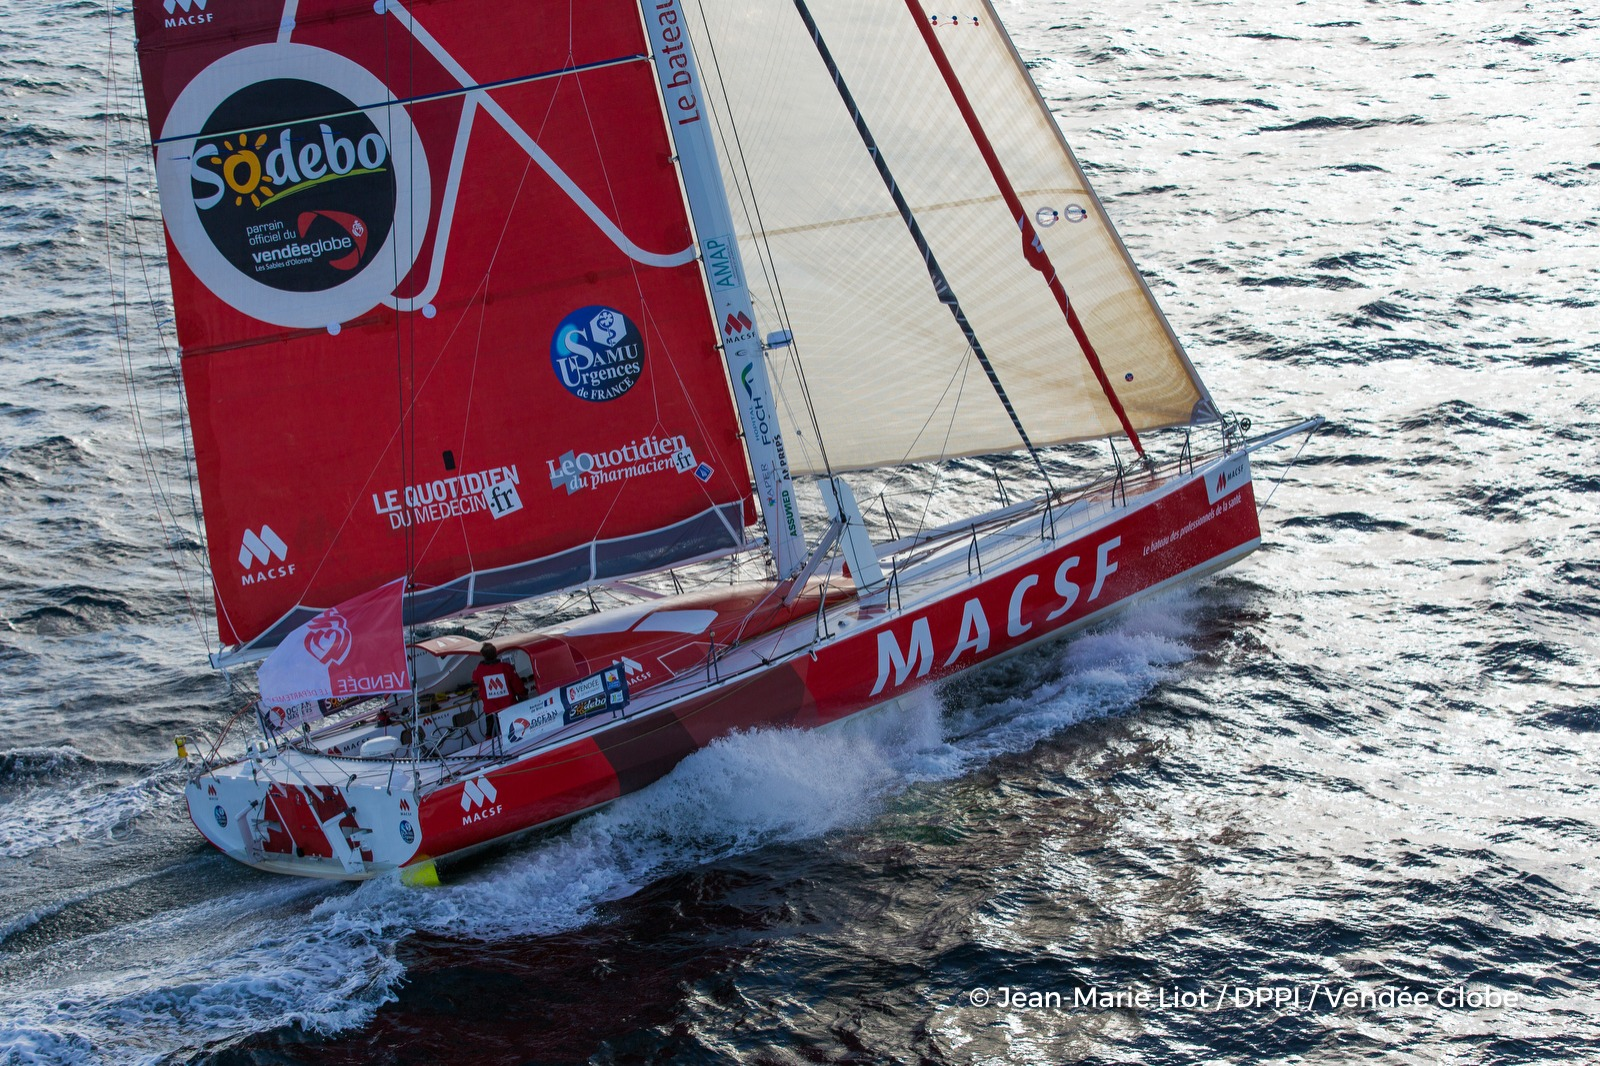 macsf-skipper-bertrand